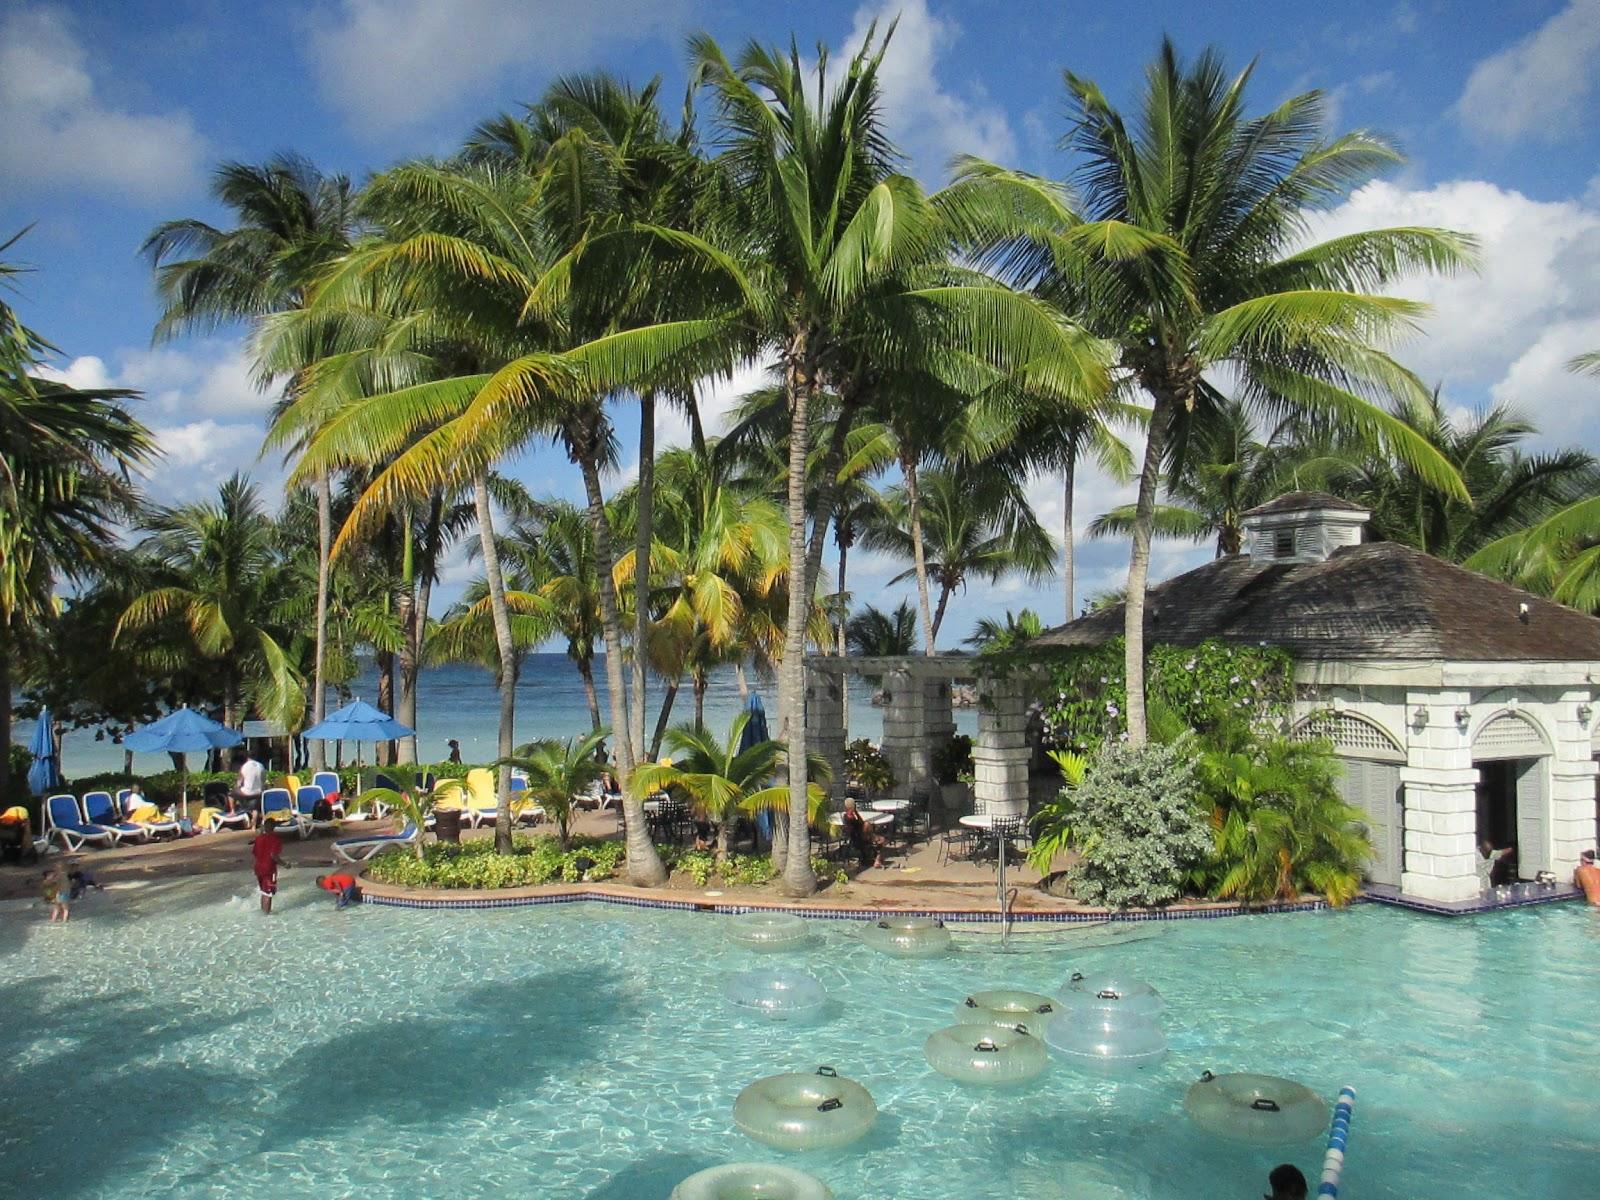 Hilton Rose Hall Beach Cabana Rental Cost